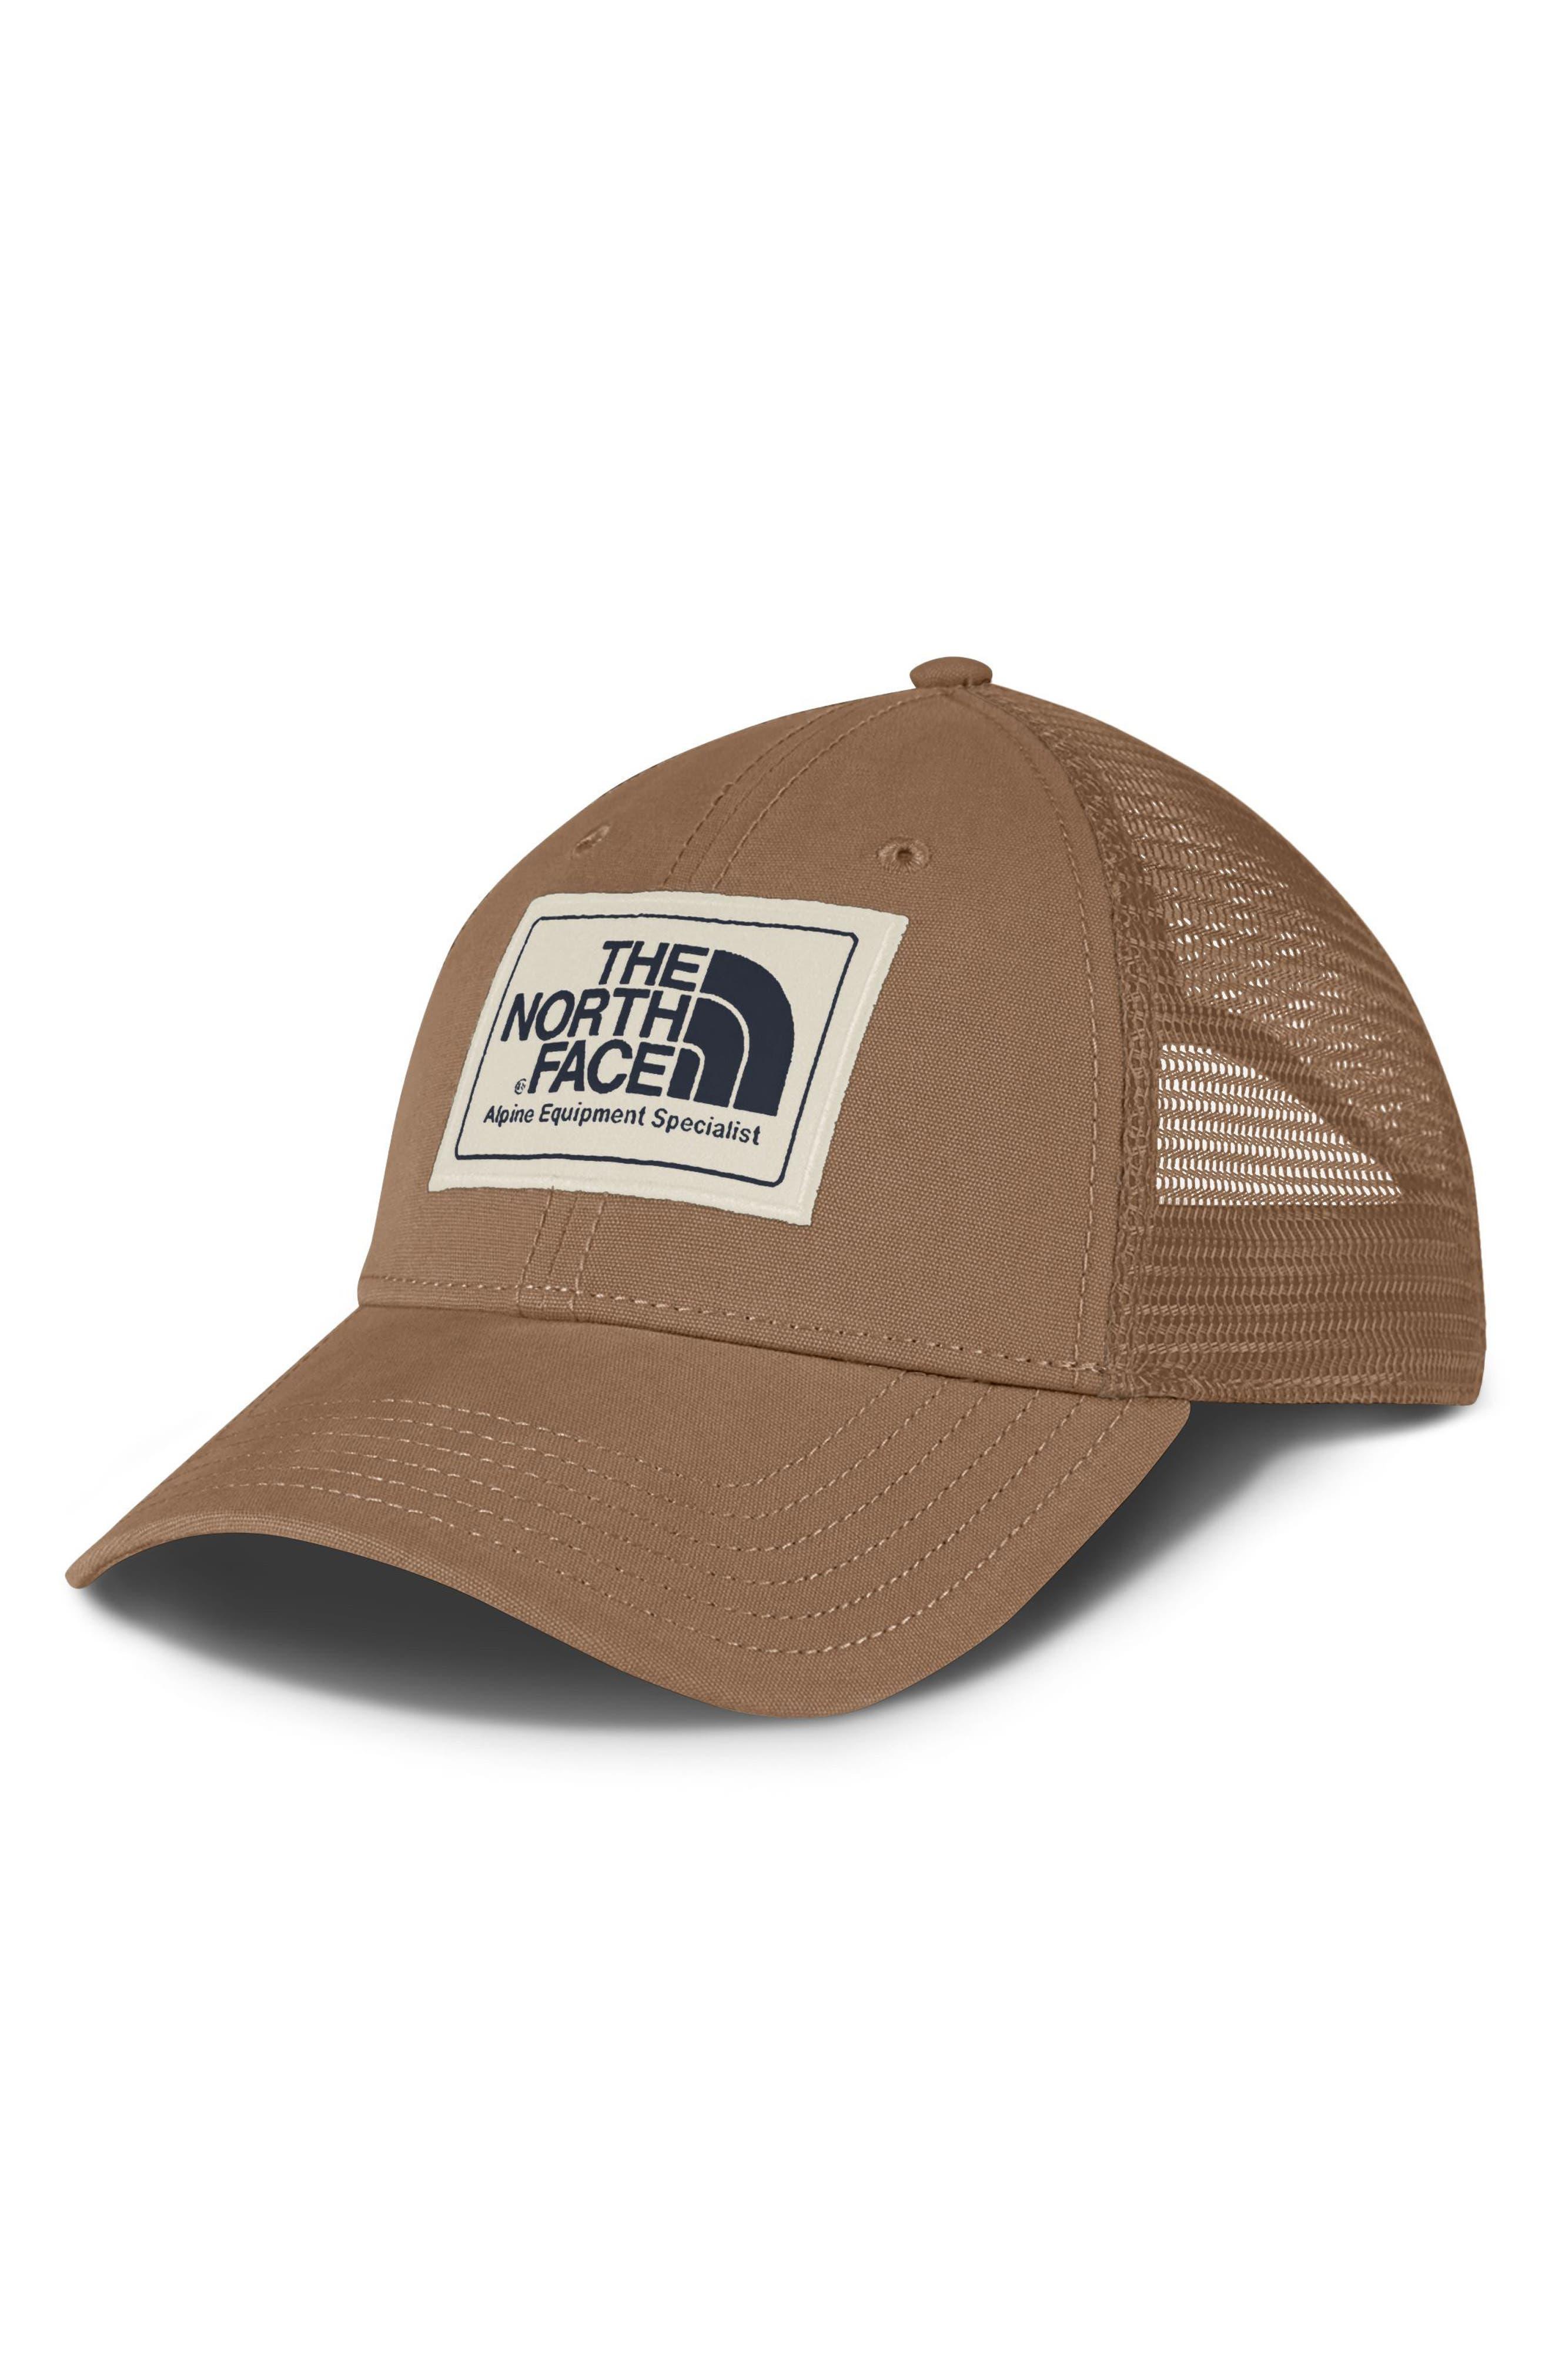 Mudder Trucker Hat,                         Main,                         color, Khaki/ Vintage White/ Navy